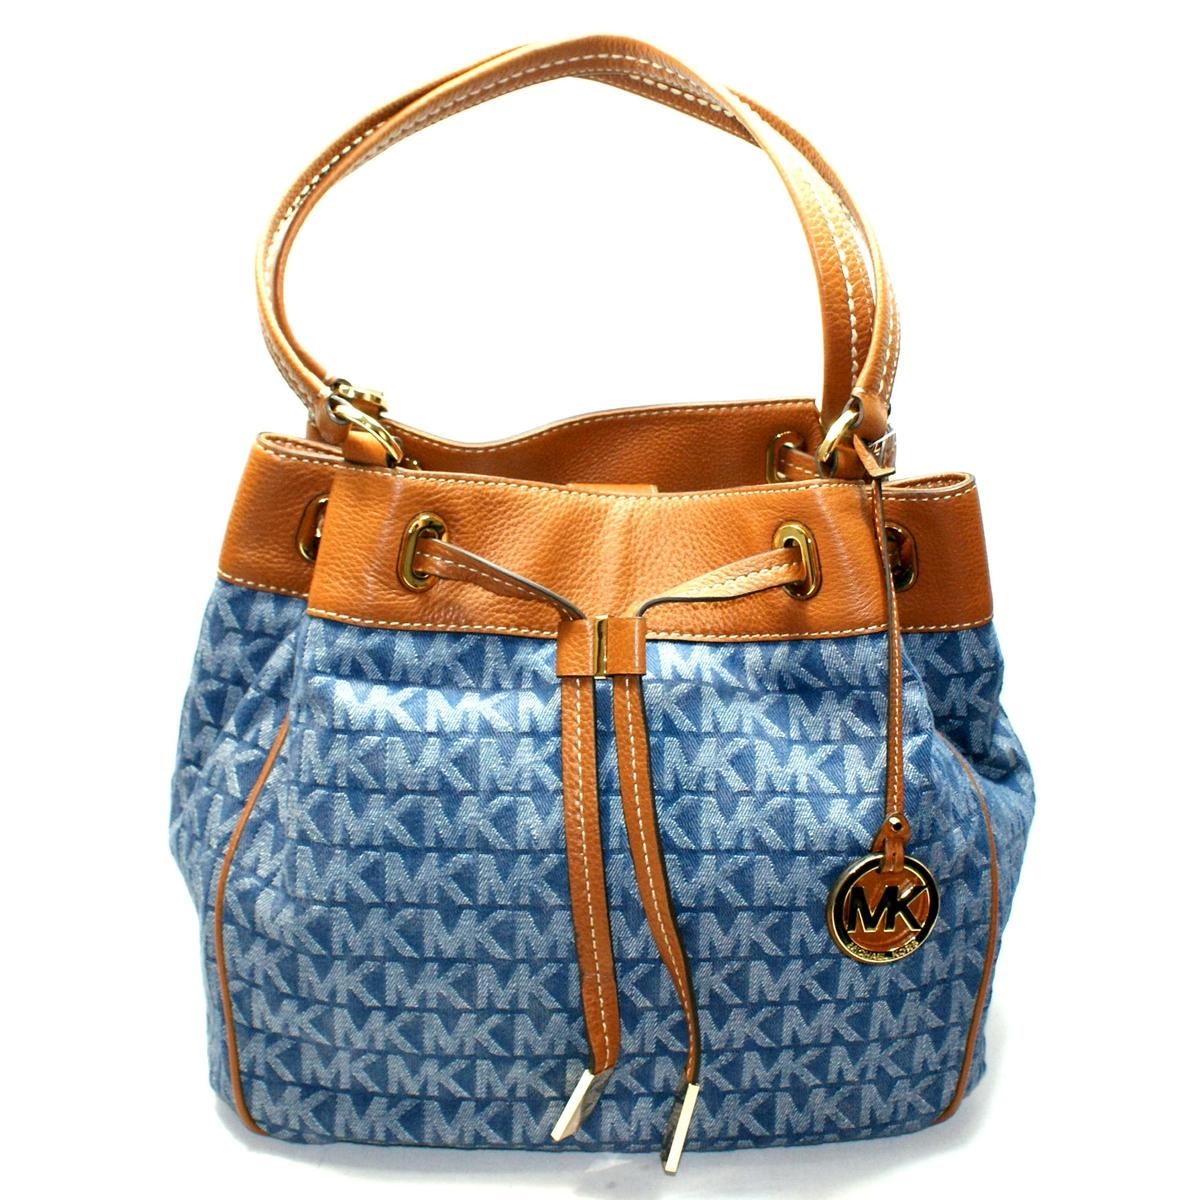 83fe72282d2d Home · Michael Kors · Marina Large Drawstring Denim Tote Bag. CLICK  THUMBNAIL TO ZOOM. Found ...